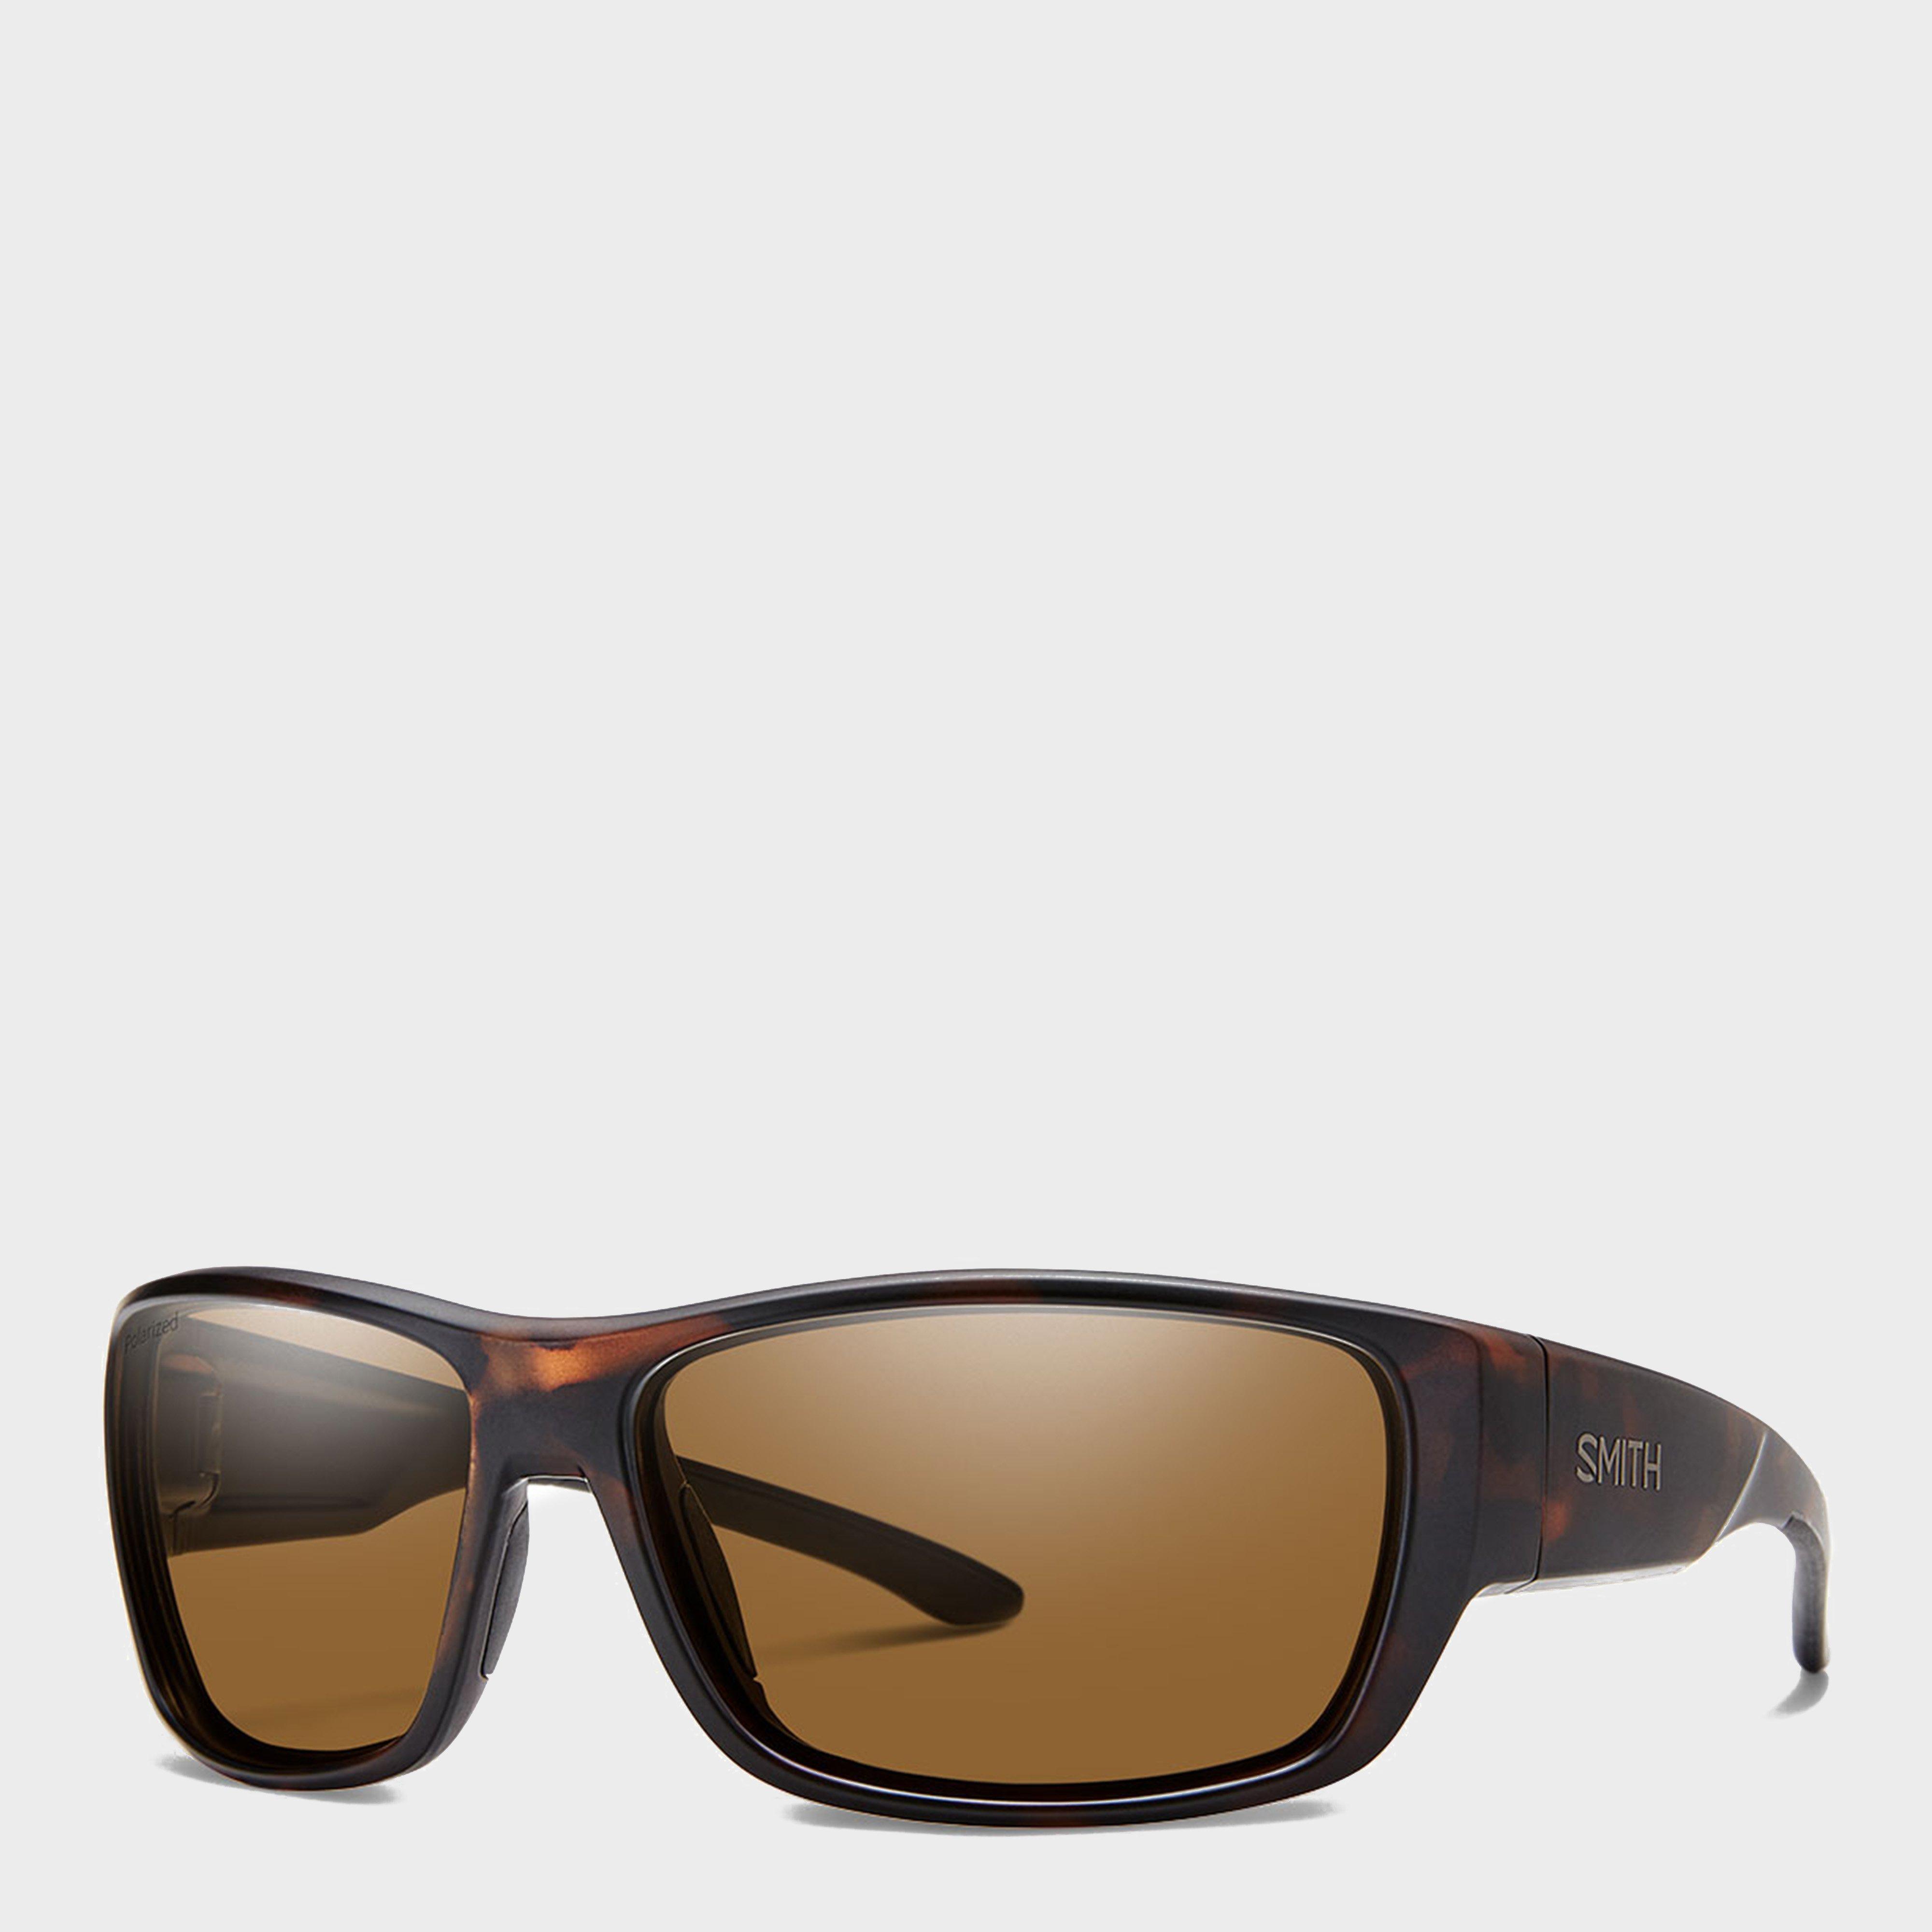 Smith Men's Forge Sunglasses, Brown